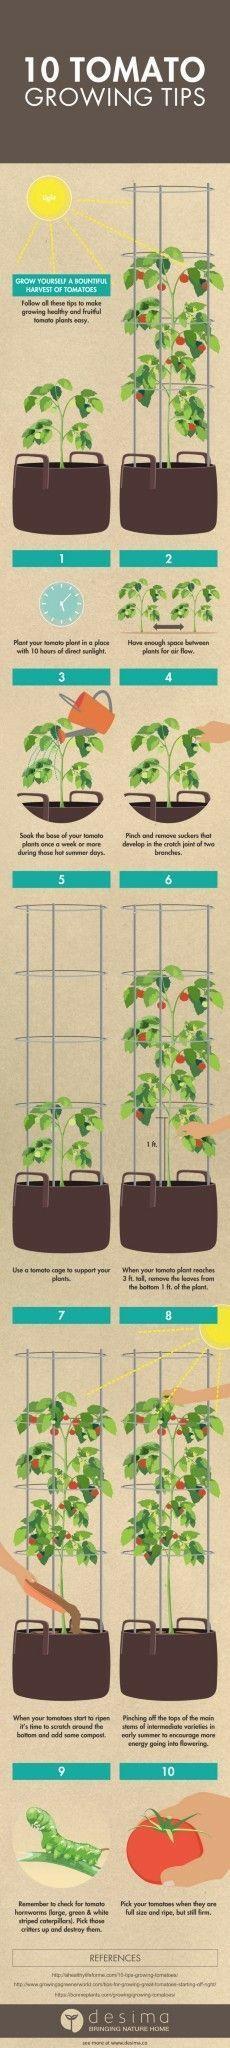 Tomato growth tips